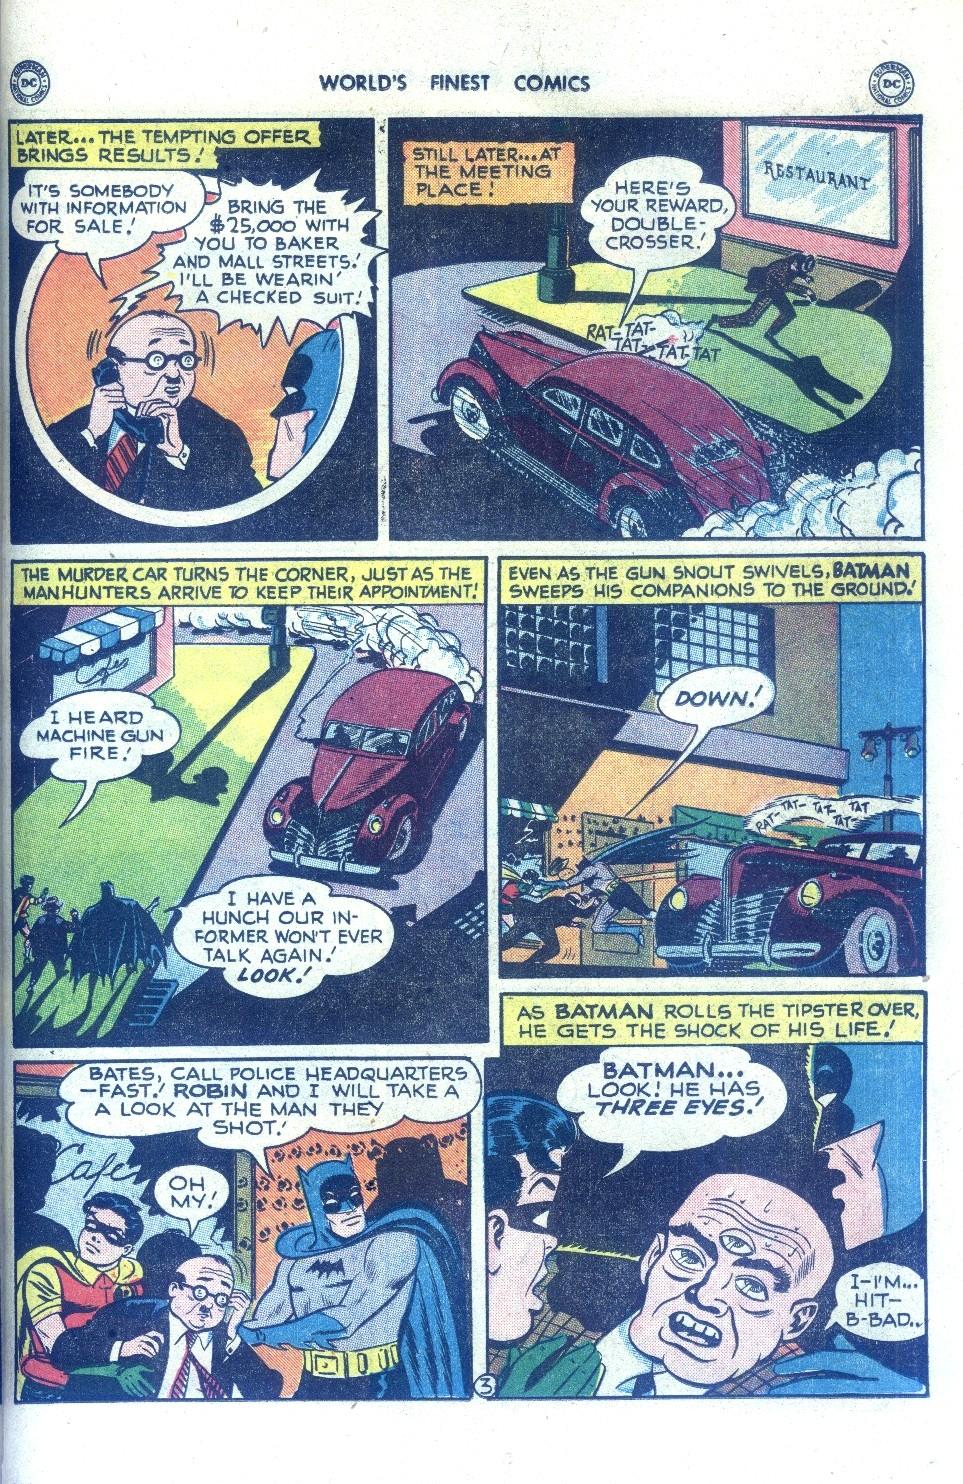 Read online World's Finest Comics comic -  Issue #43 - 63